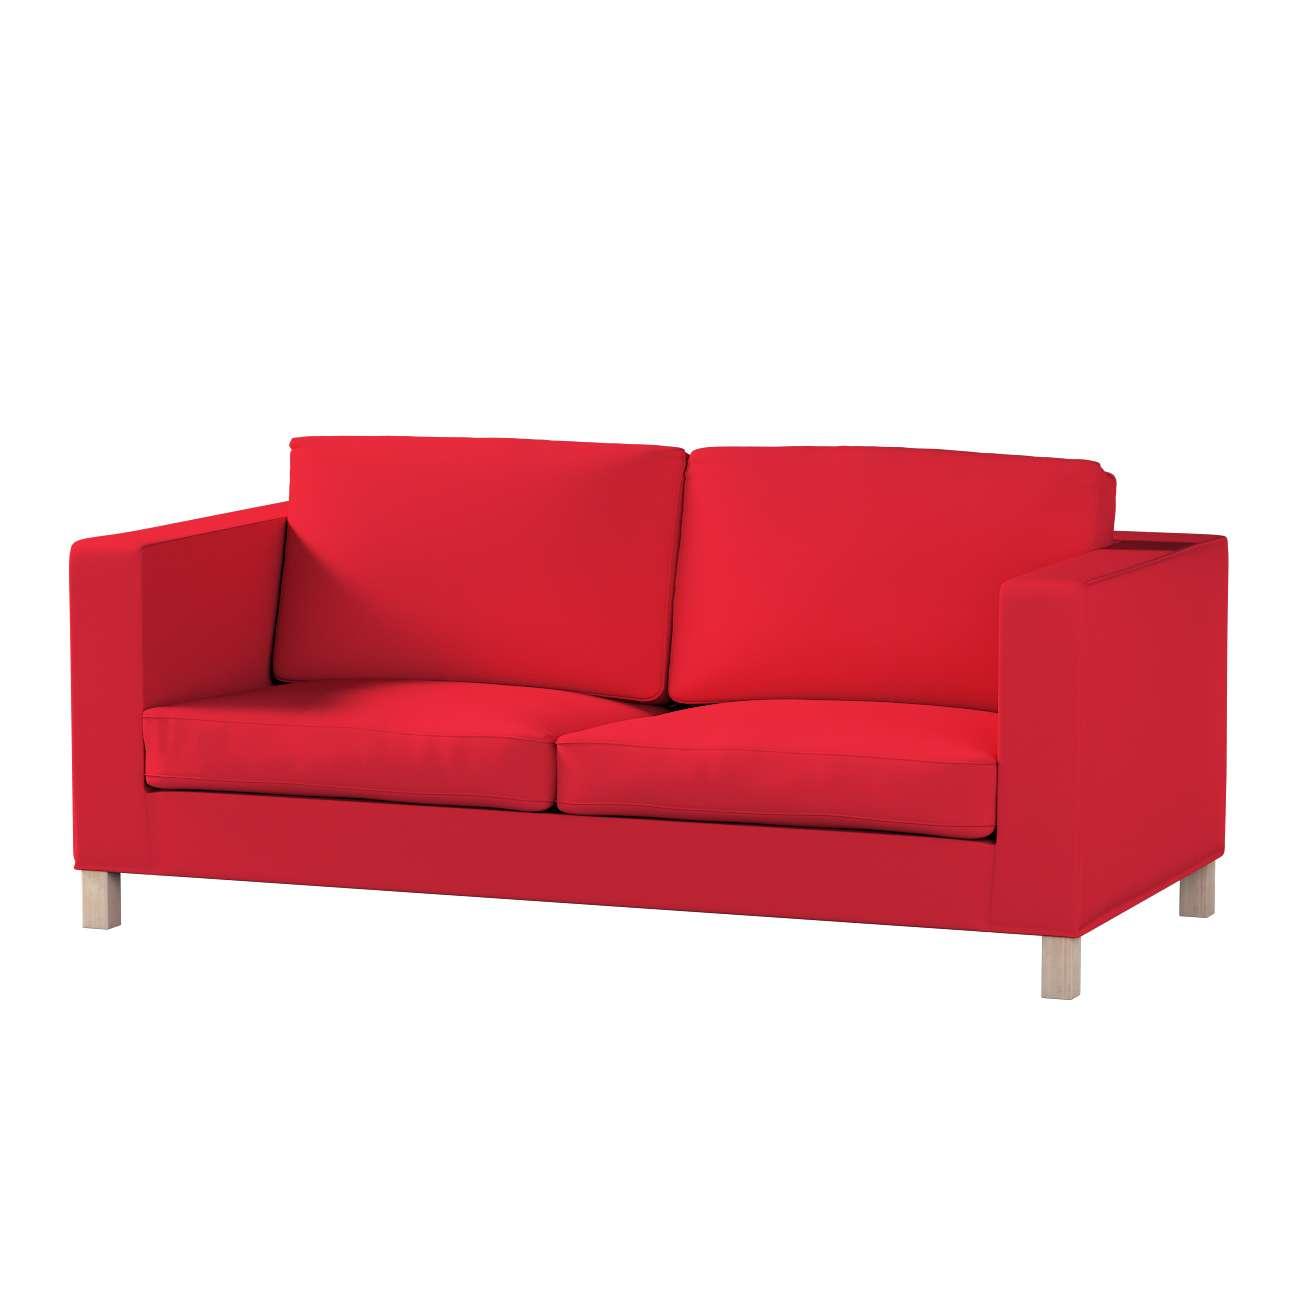 Potah na pohovku IKEA  Karlanda rozkládací, krátký pohovka Karlanda rozkládací v kolekci Cotton Panama, látka: 702-04